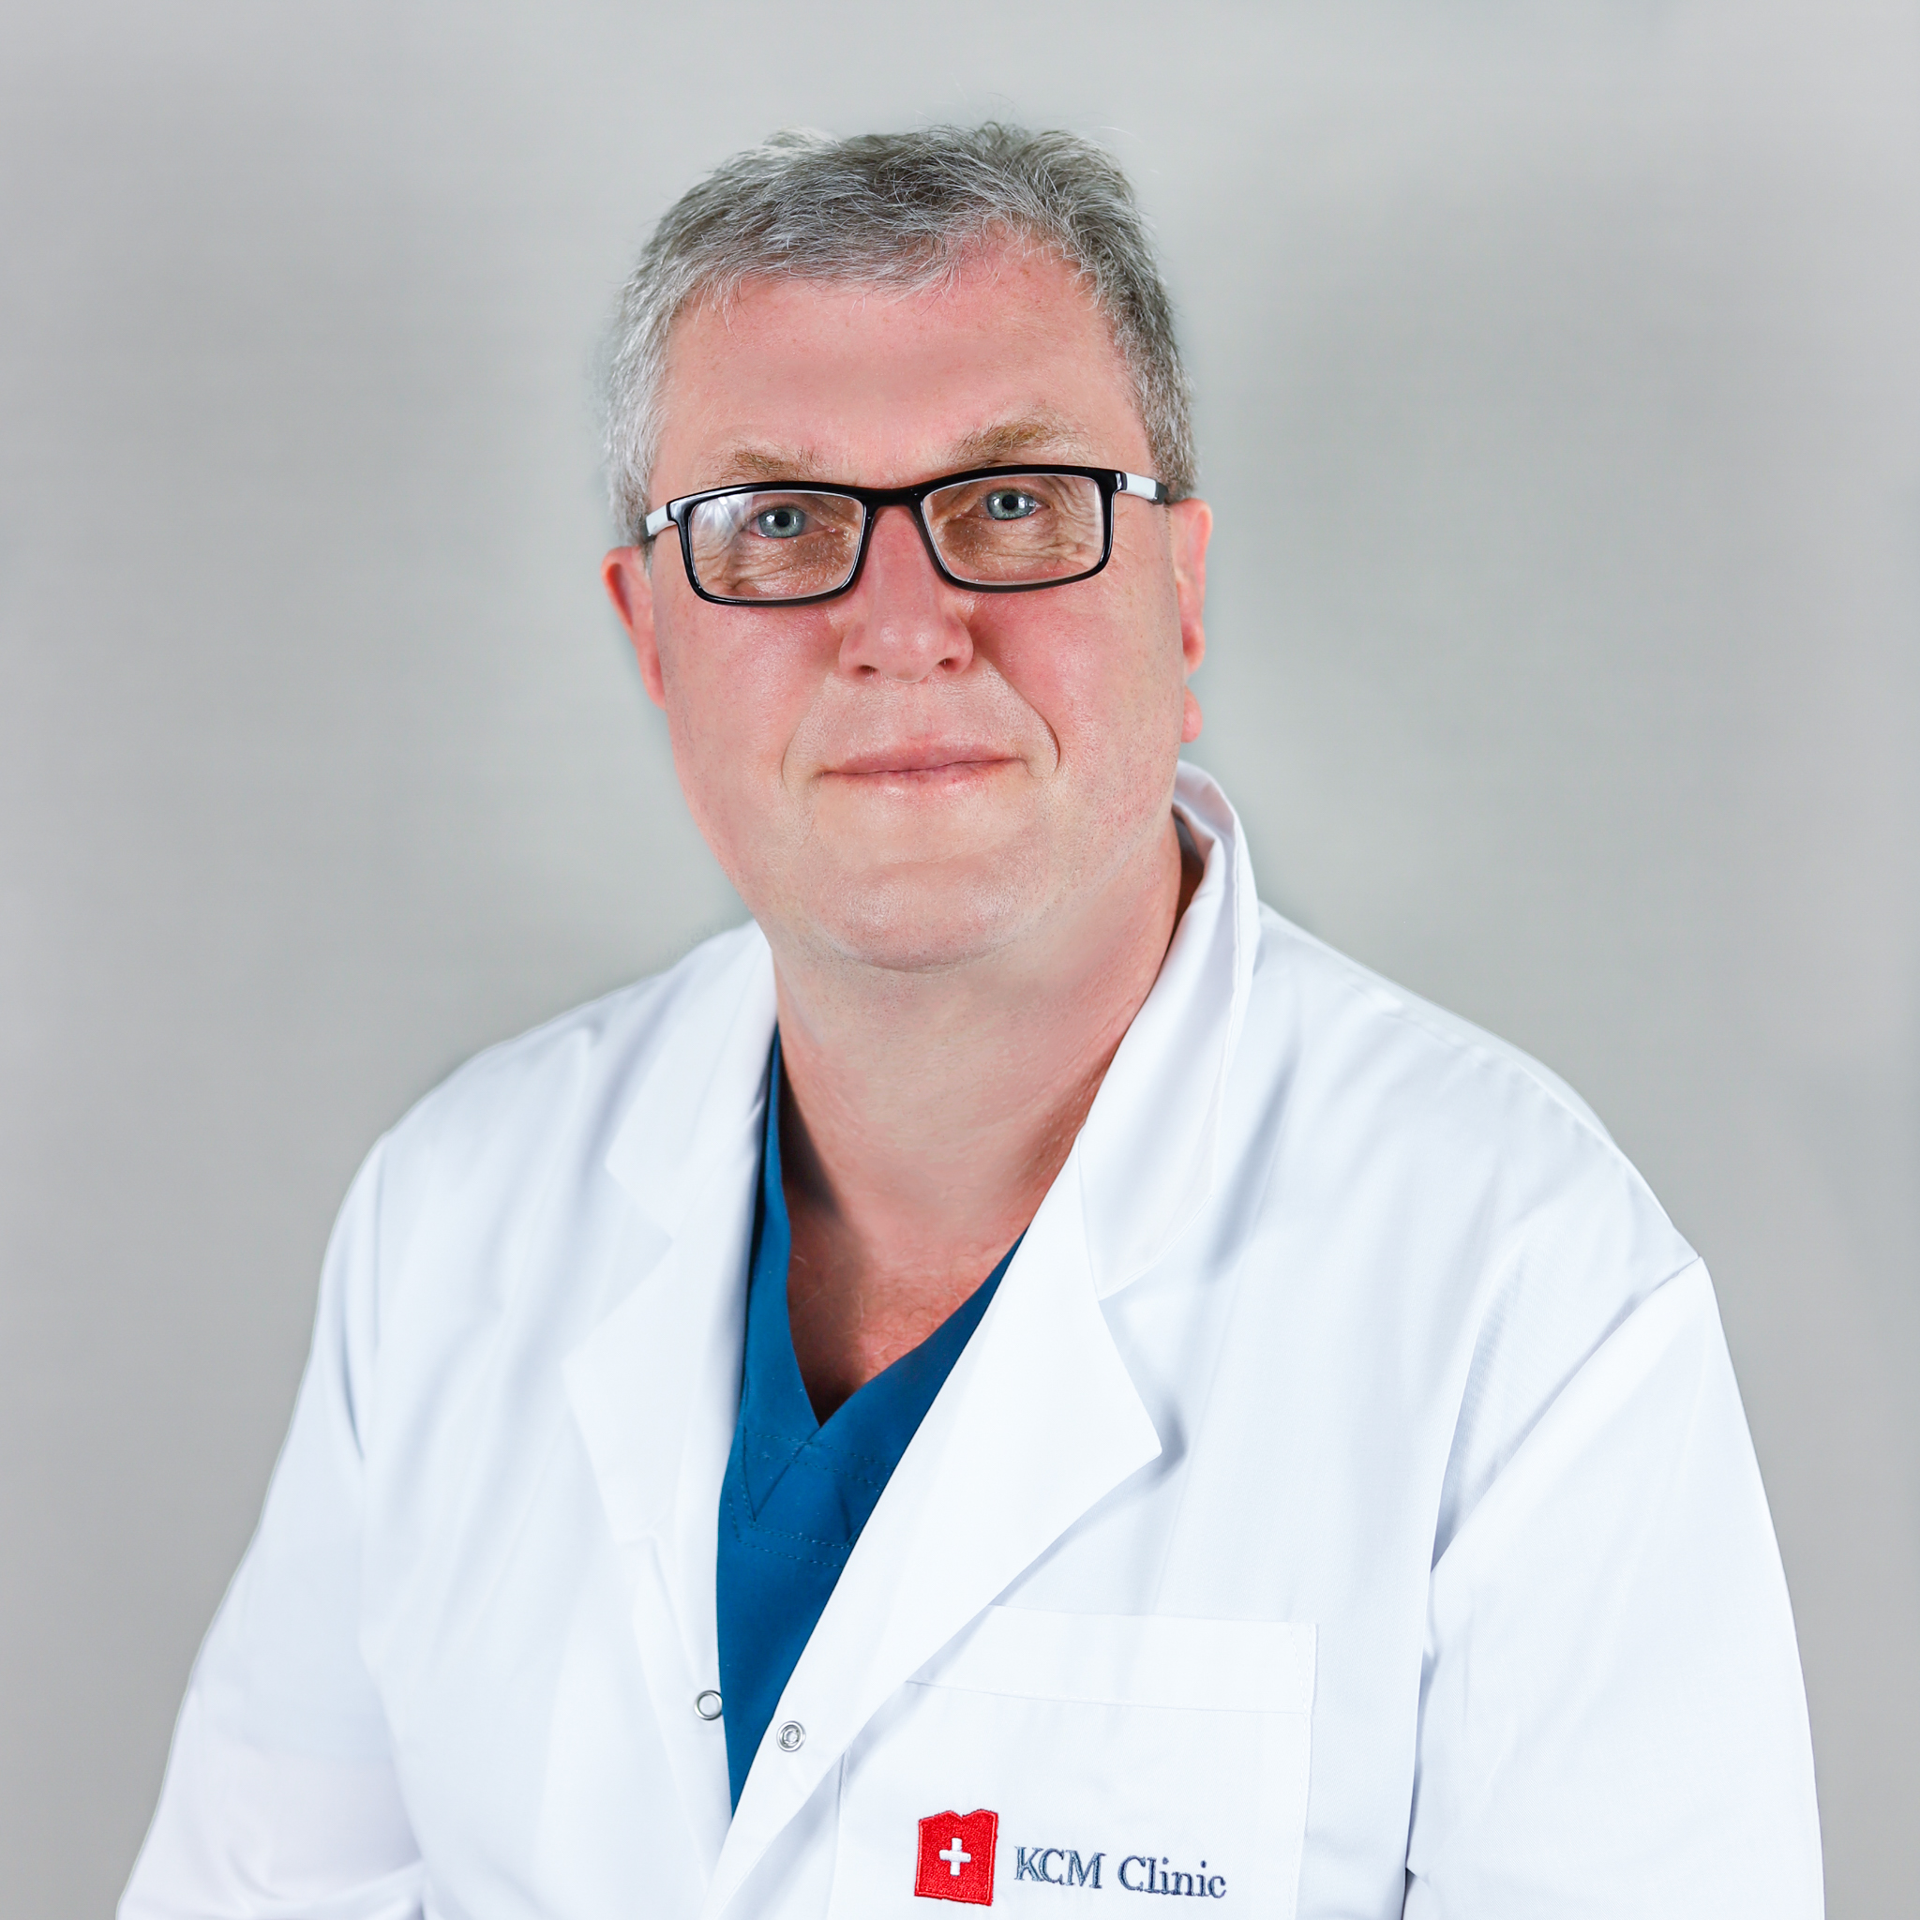 Lek. dent. Piotr Zborowski